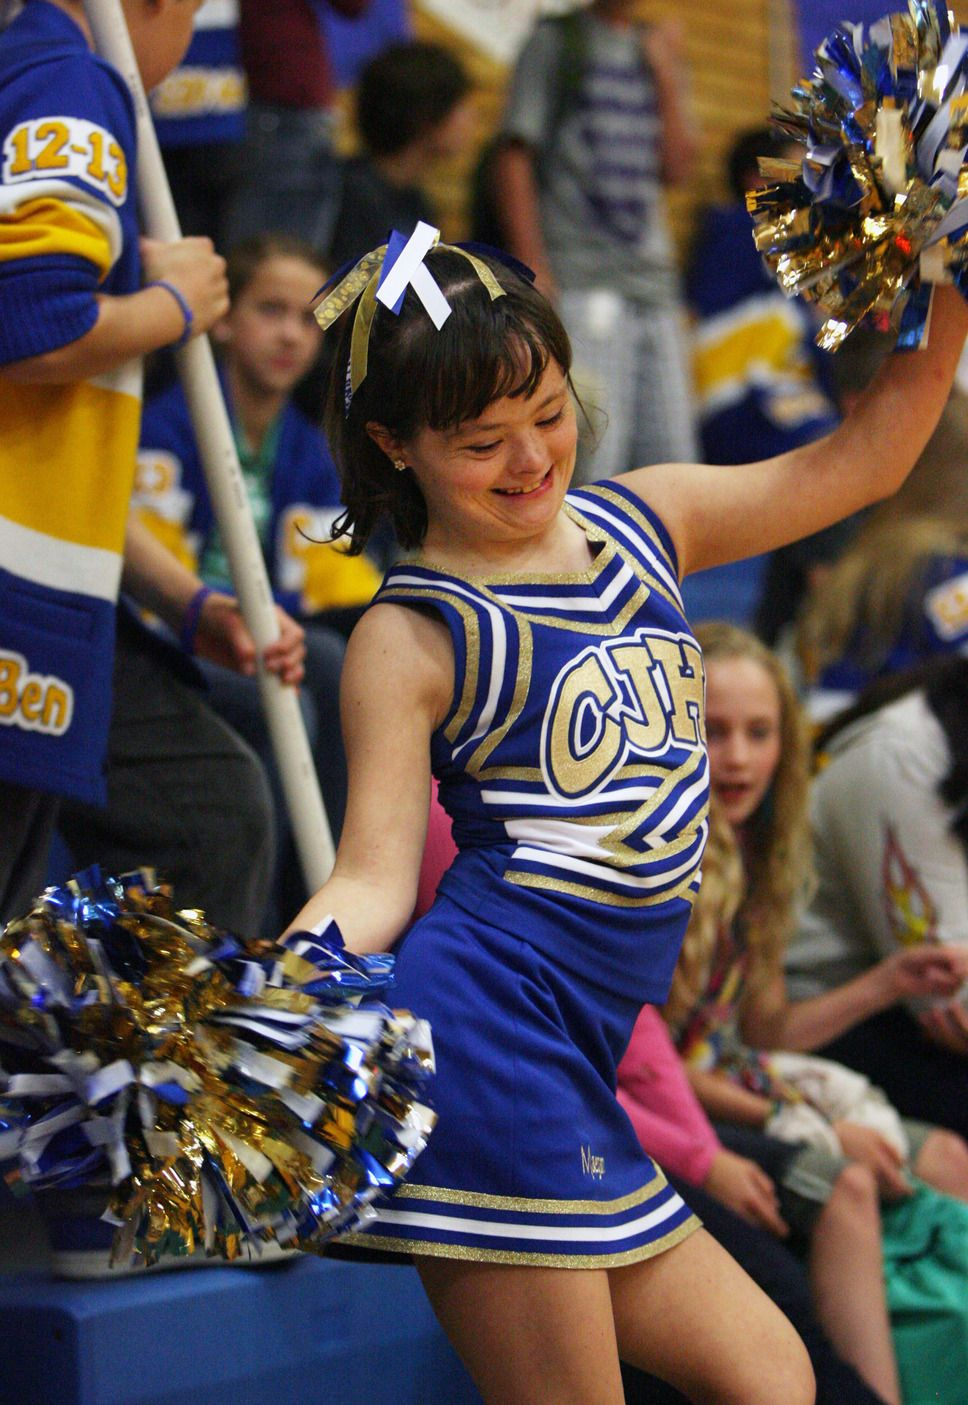 Steve Griffin The Salt Lake Tribune Centerville Junior High Cheerleader Maegan Lindsay Cheers On The Sidelines D Cheerleading Special Needs Kids Tribune